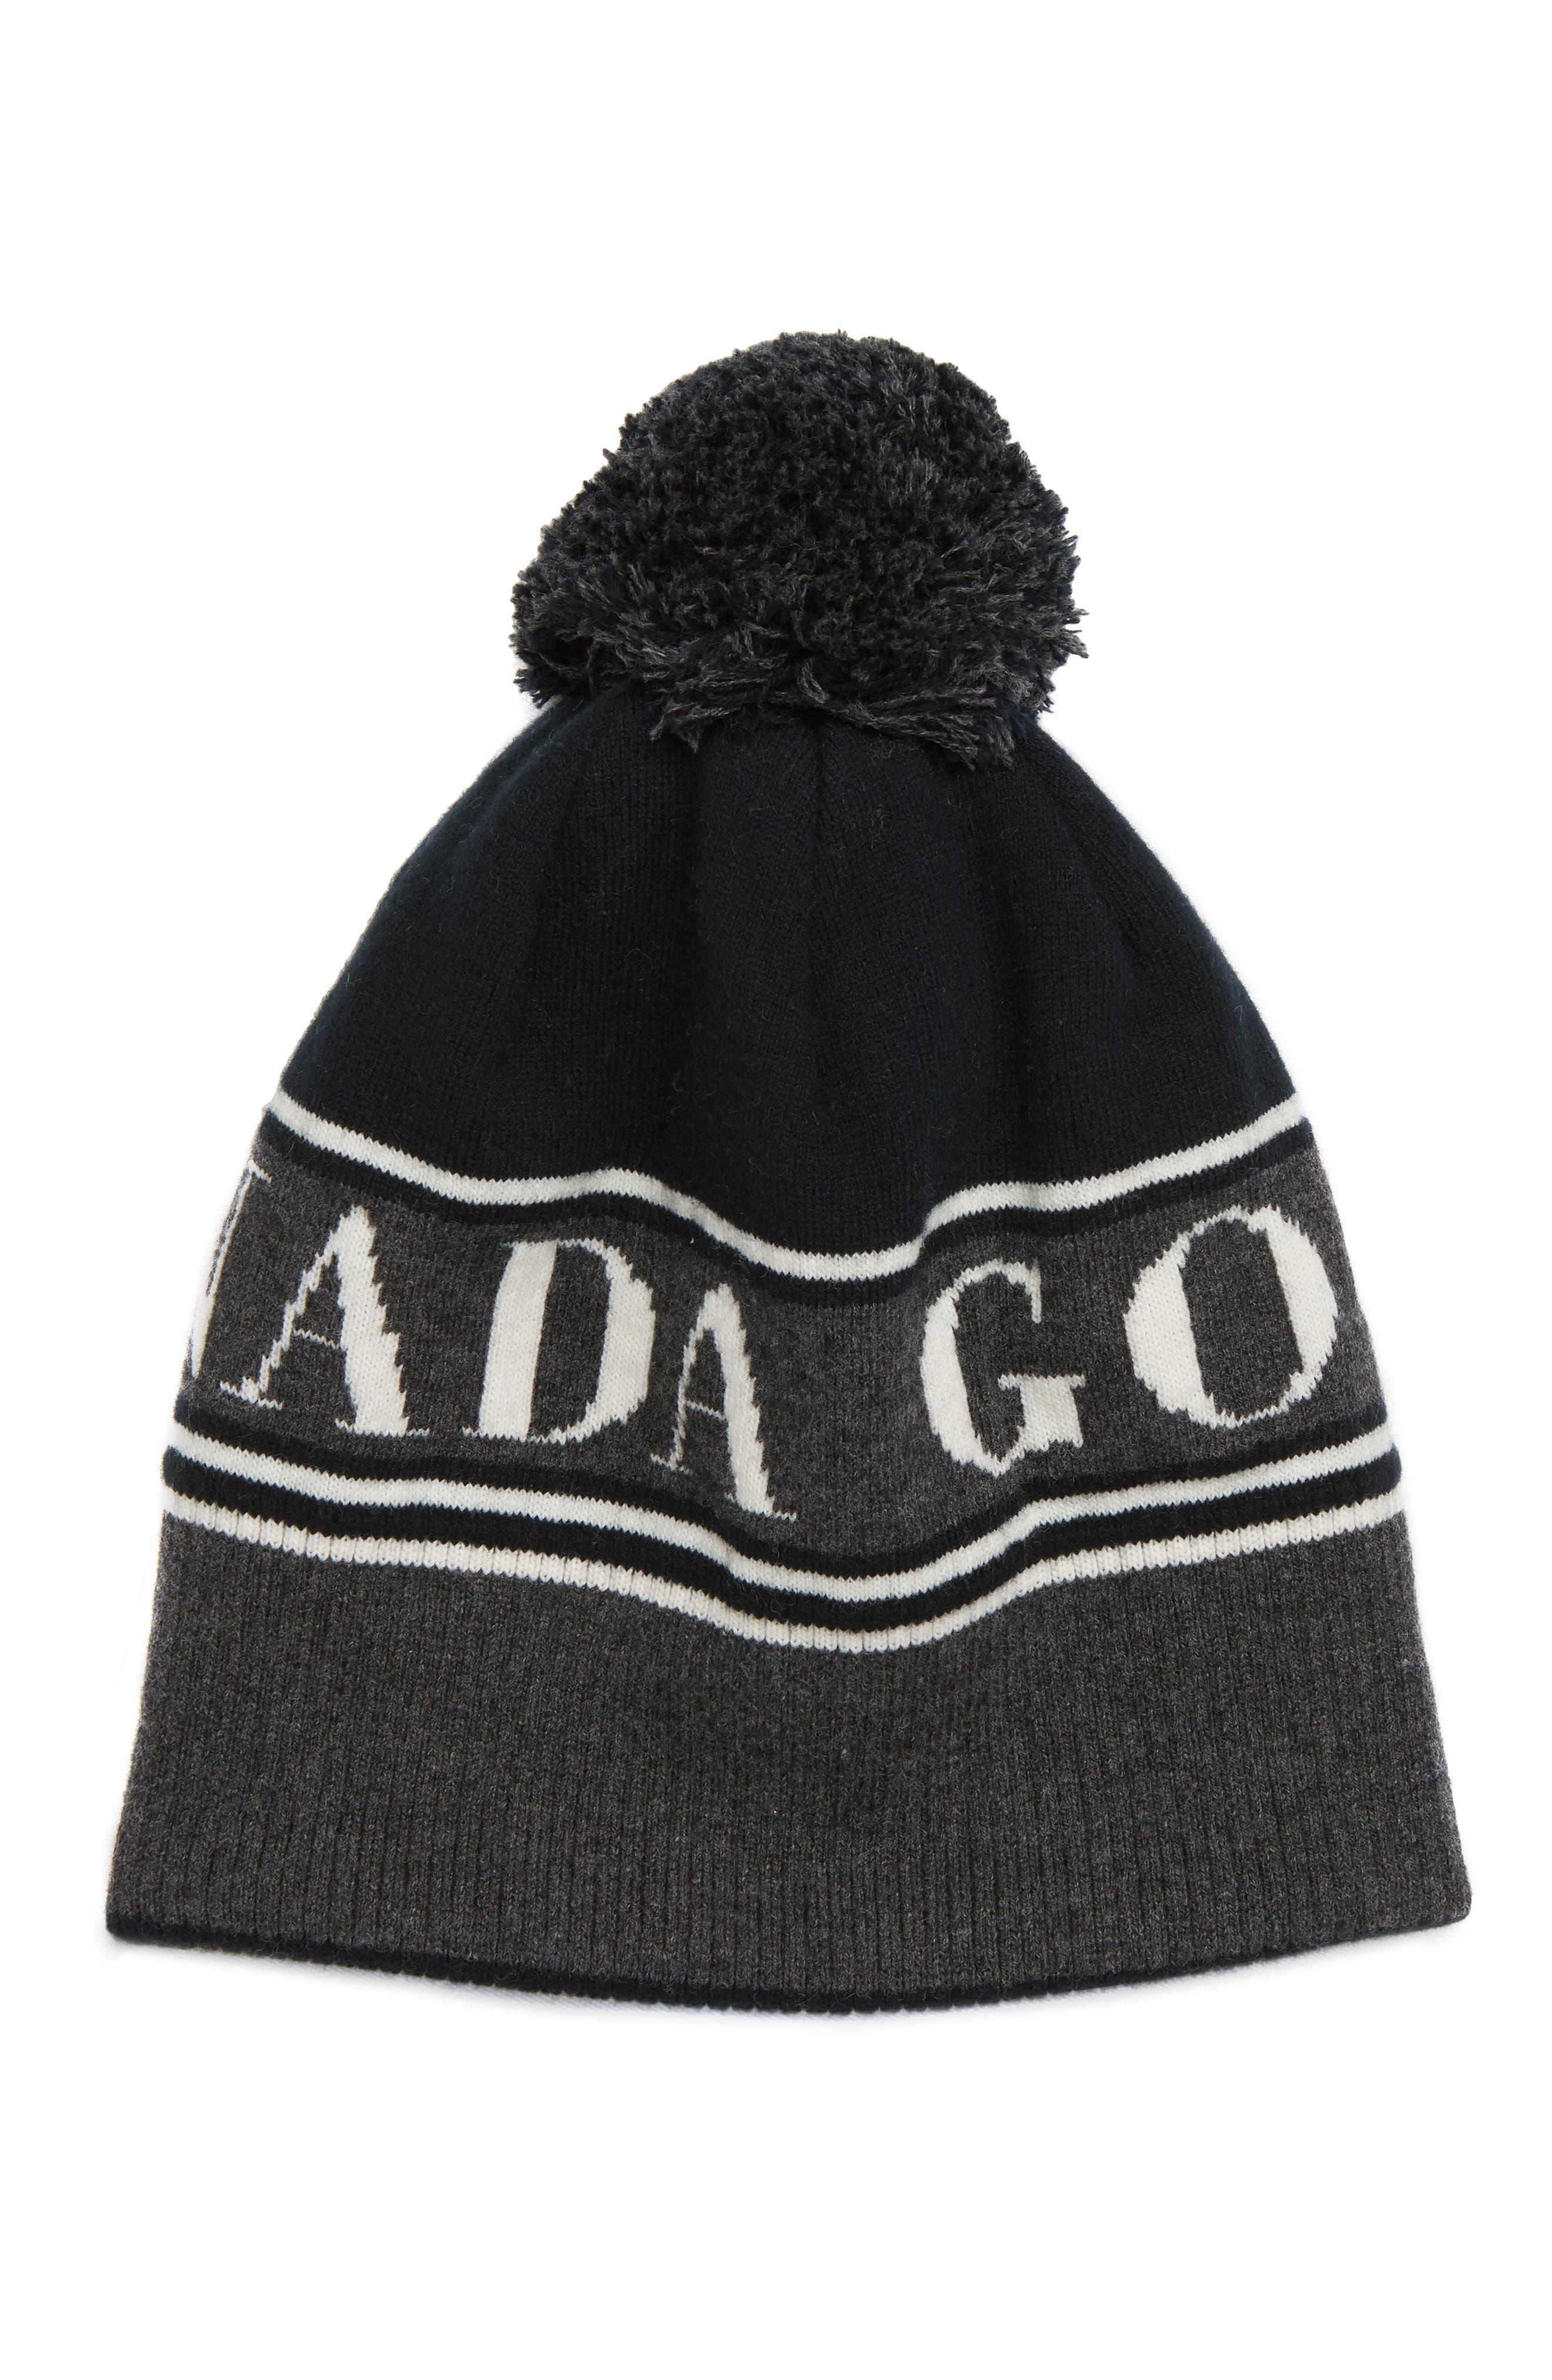 44124c16d Men's Beanies: Knit Caps & Winter Hats | Nordstrom